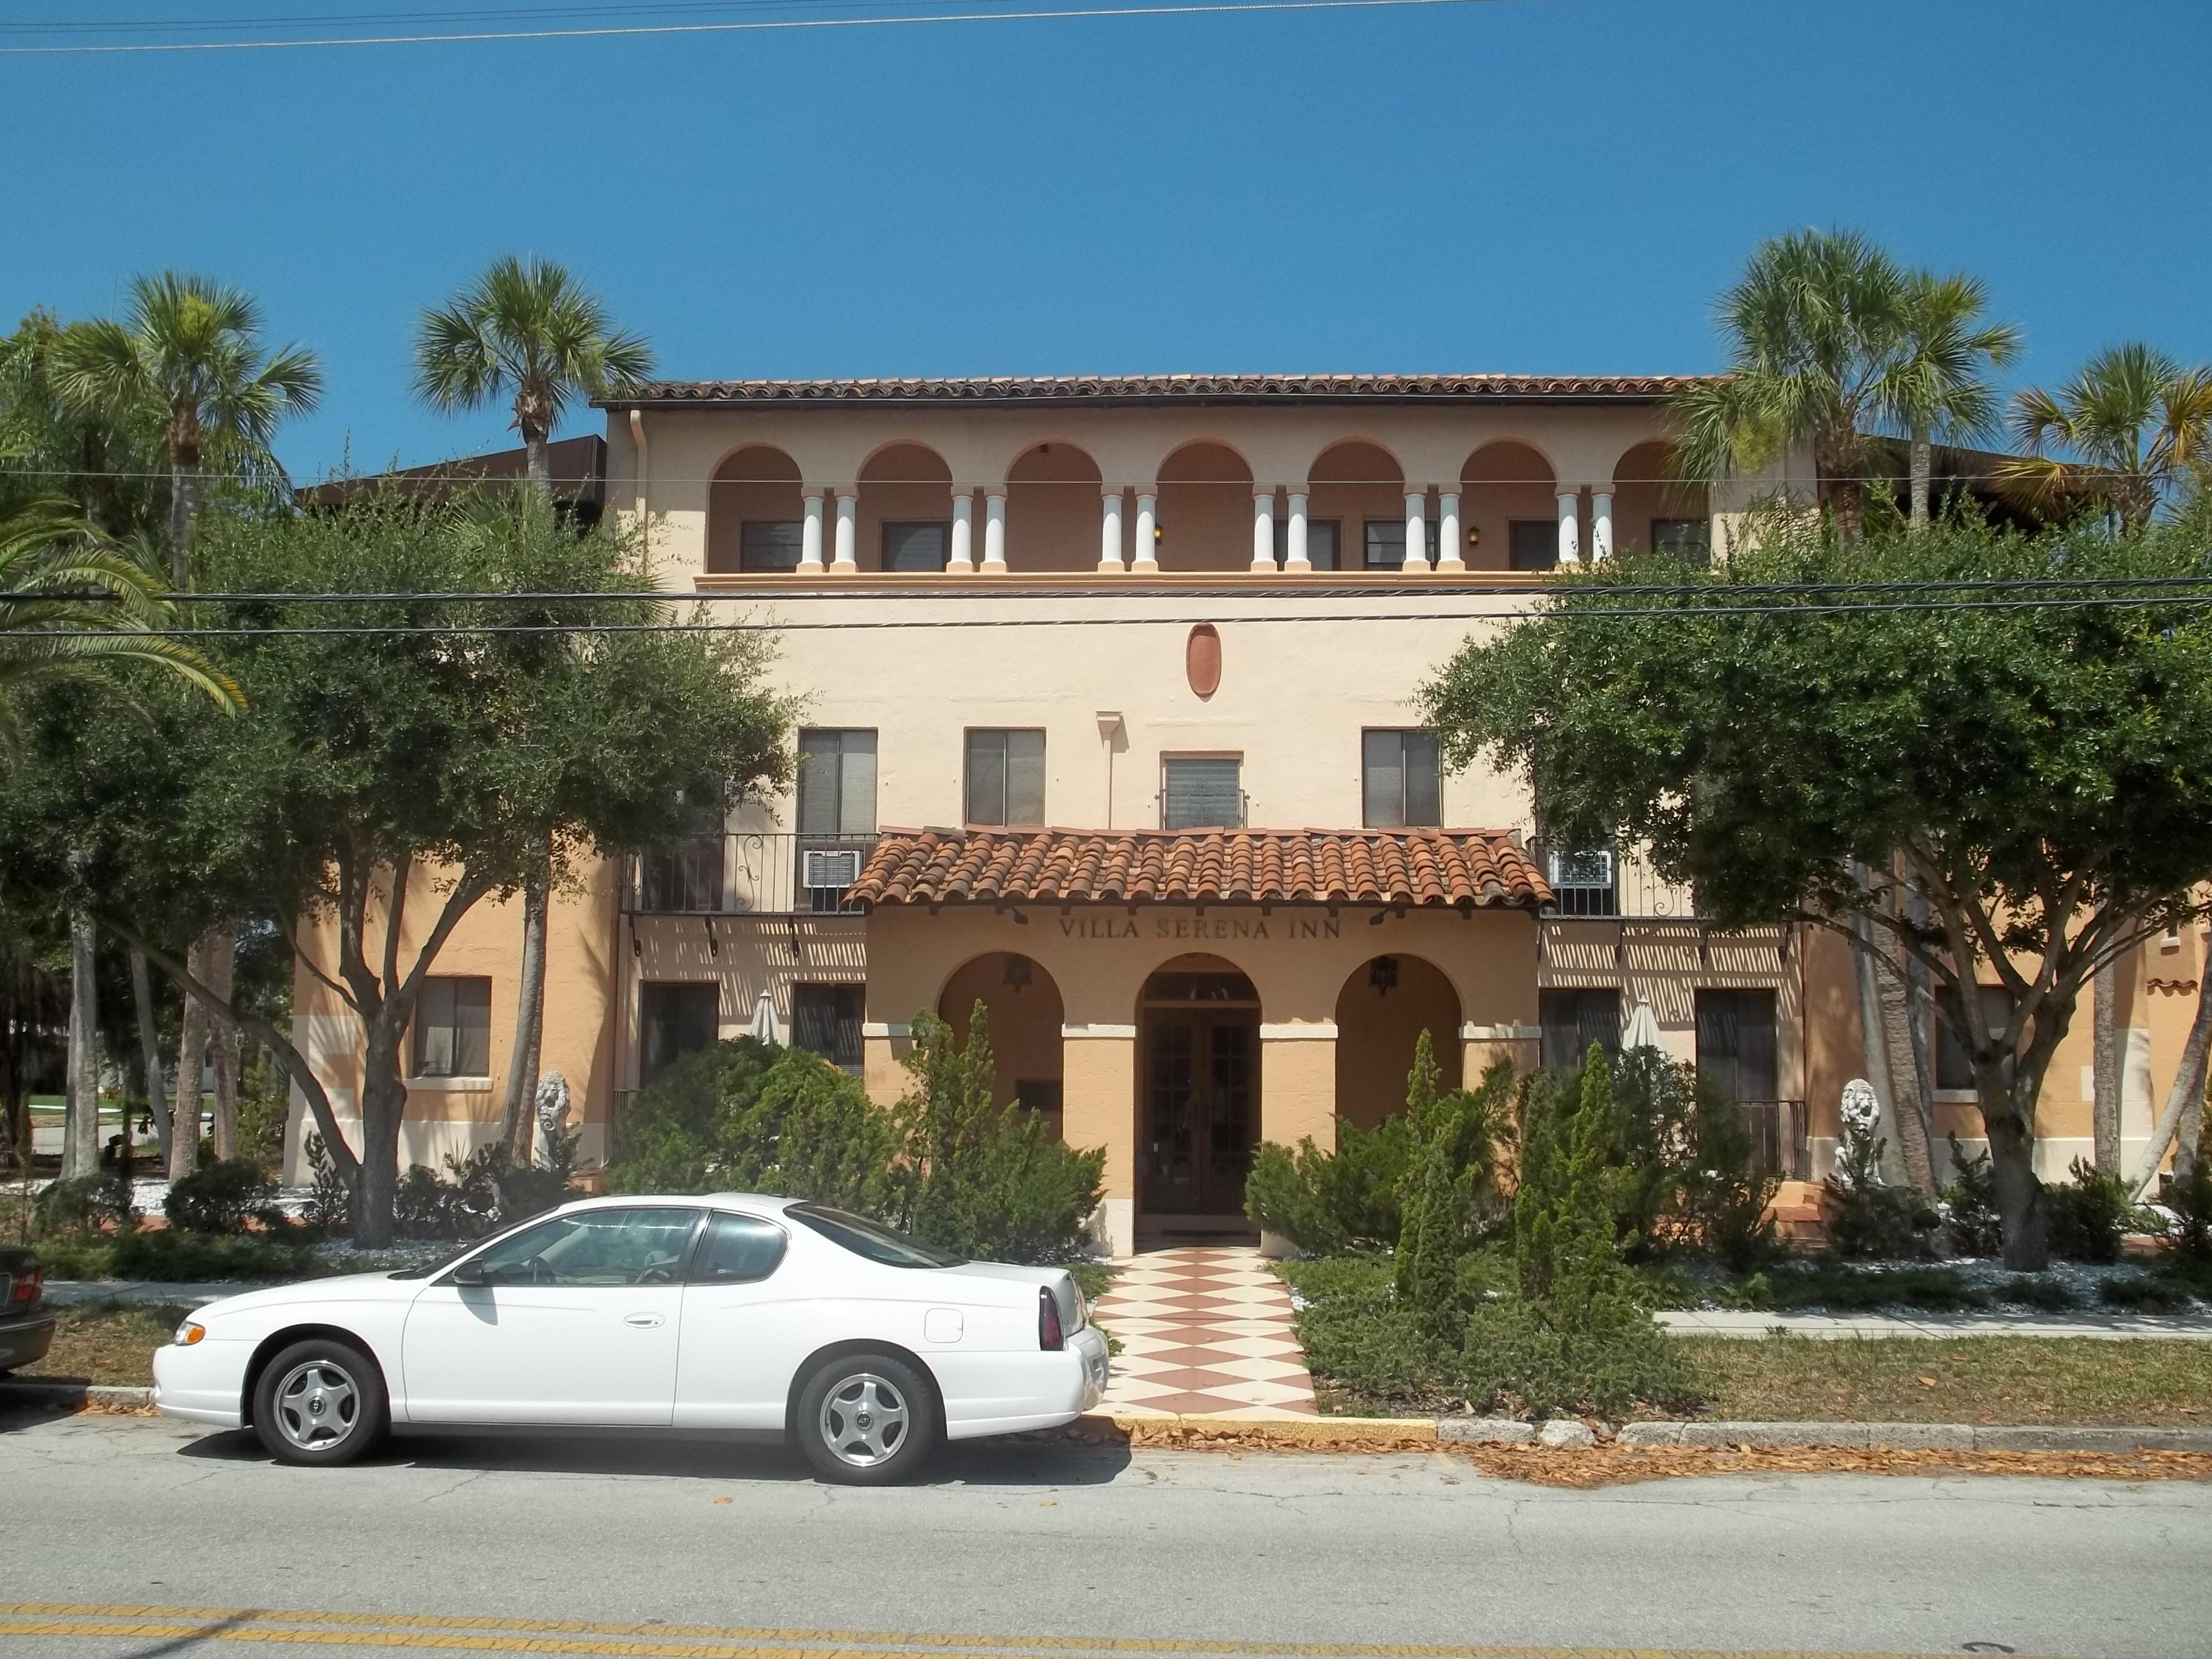 File Sarasota FL Villa Serena Apts01 Wikimedia mons